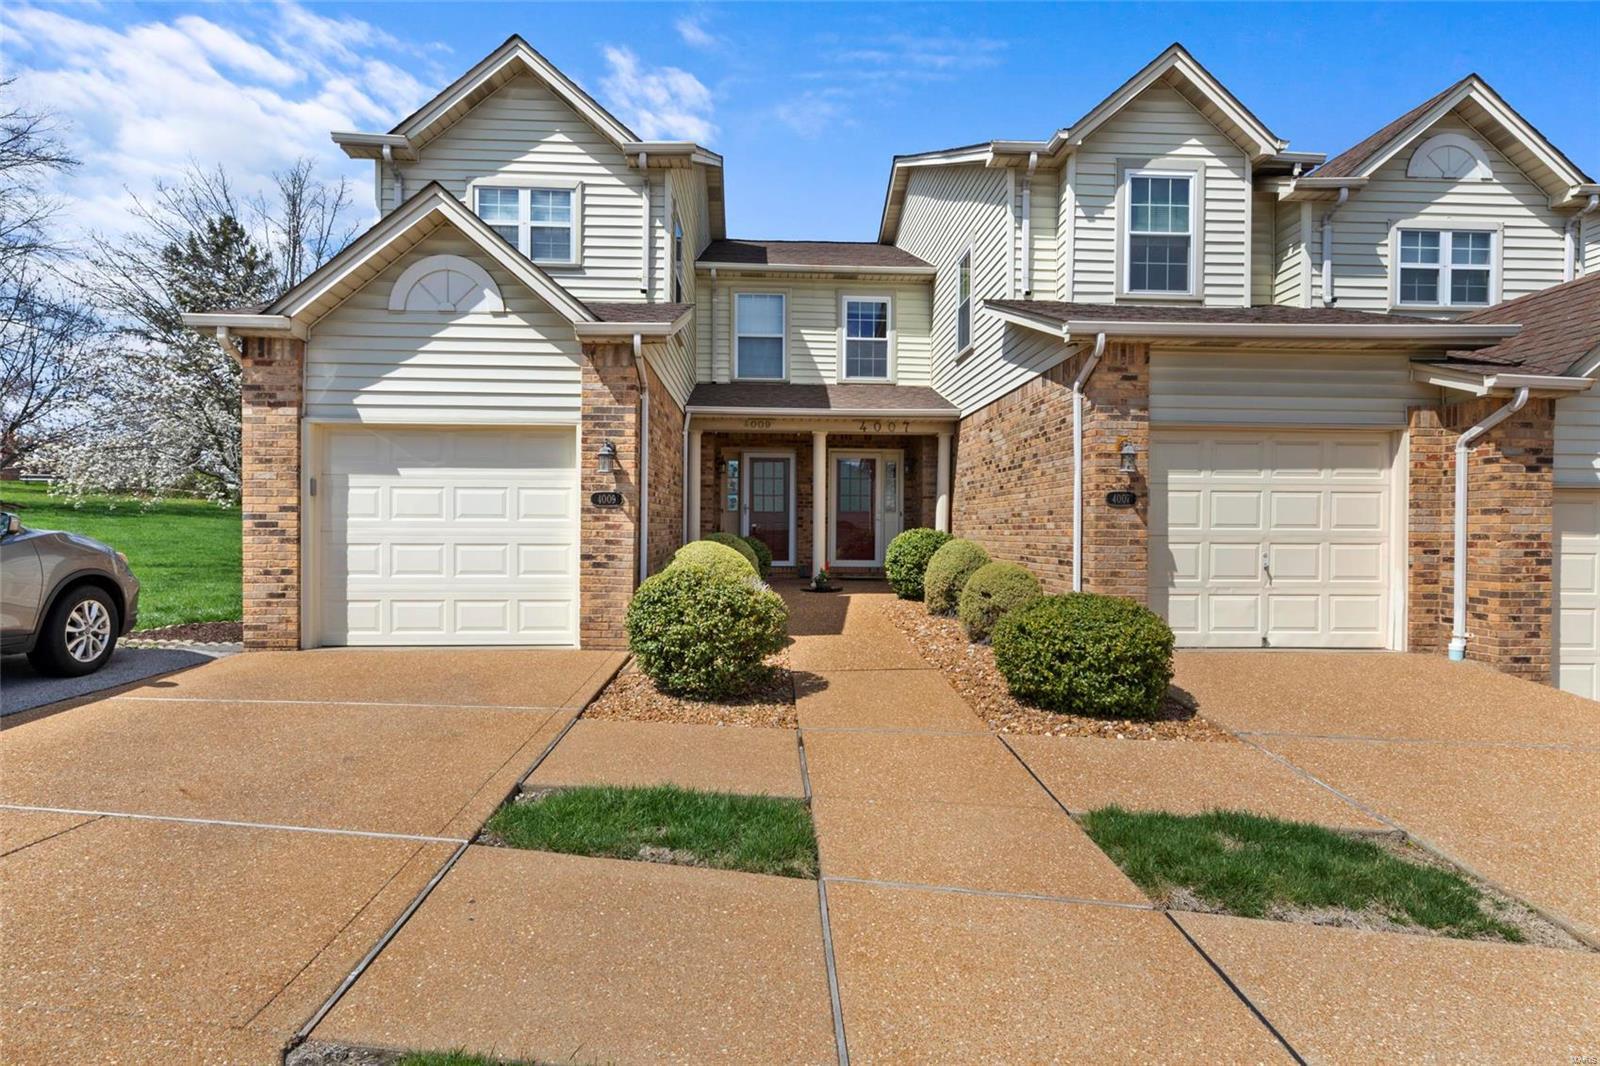 4009 Morningview court Property Photo - Mehlville, MO real estate listing